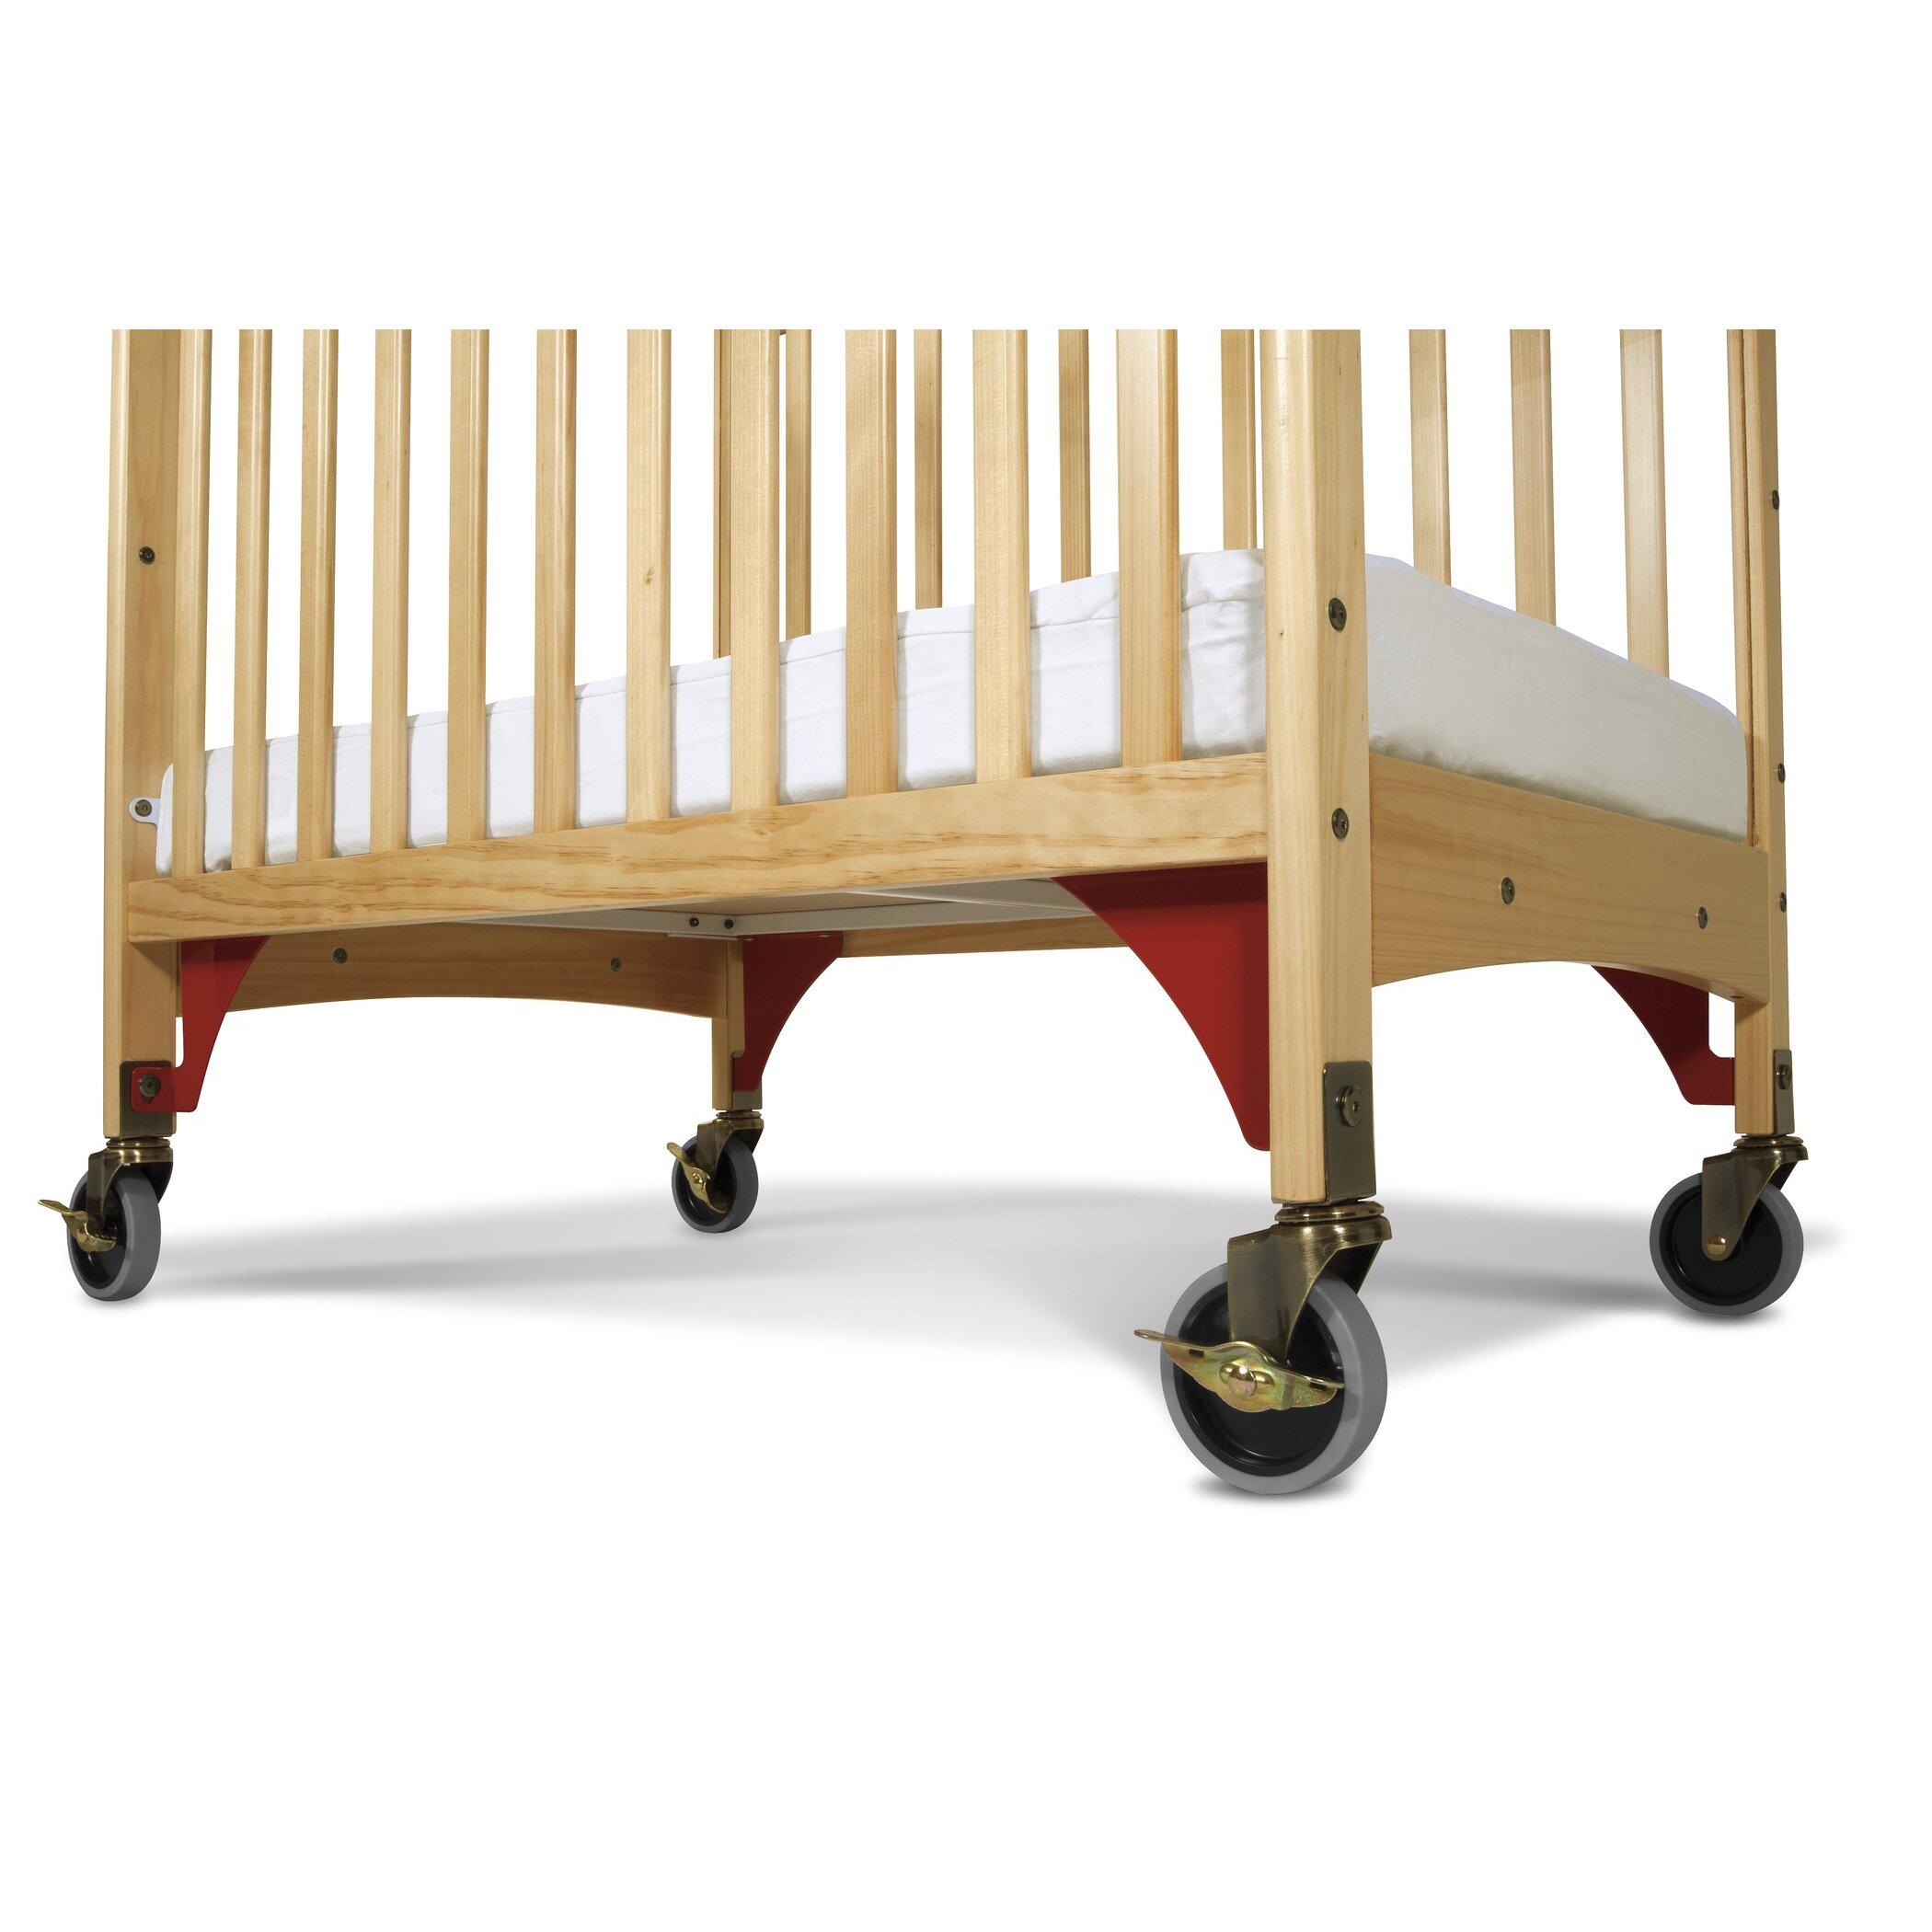 Evacuation crib for sale - Safe Haven Professional Series Evacuation Compact Crib With Mattress